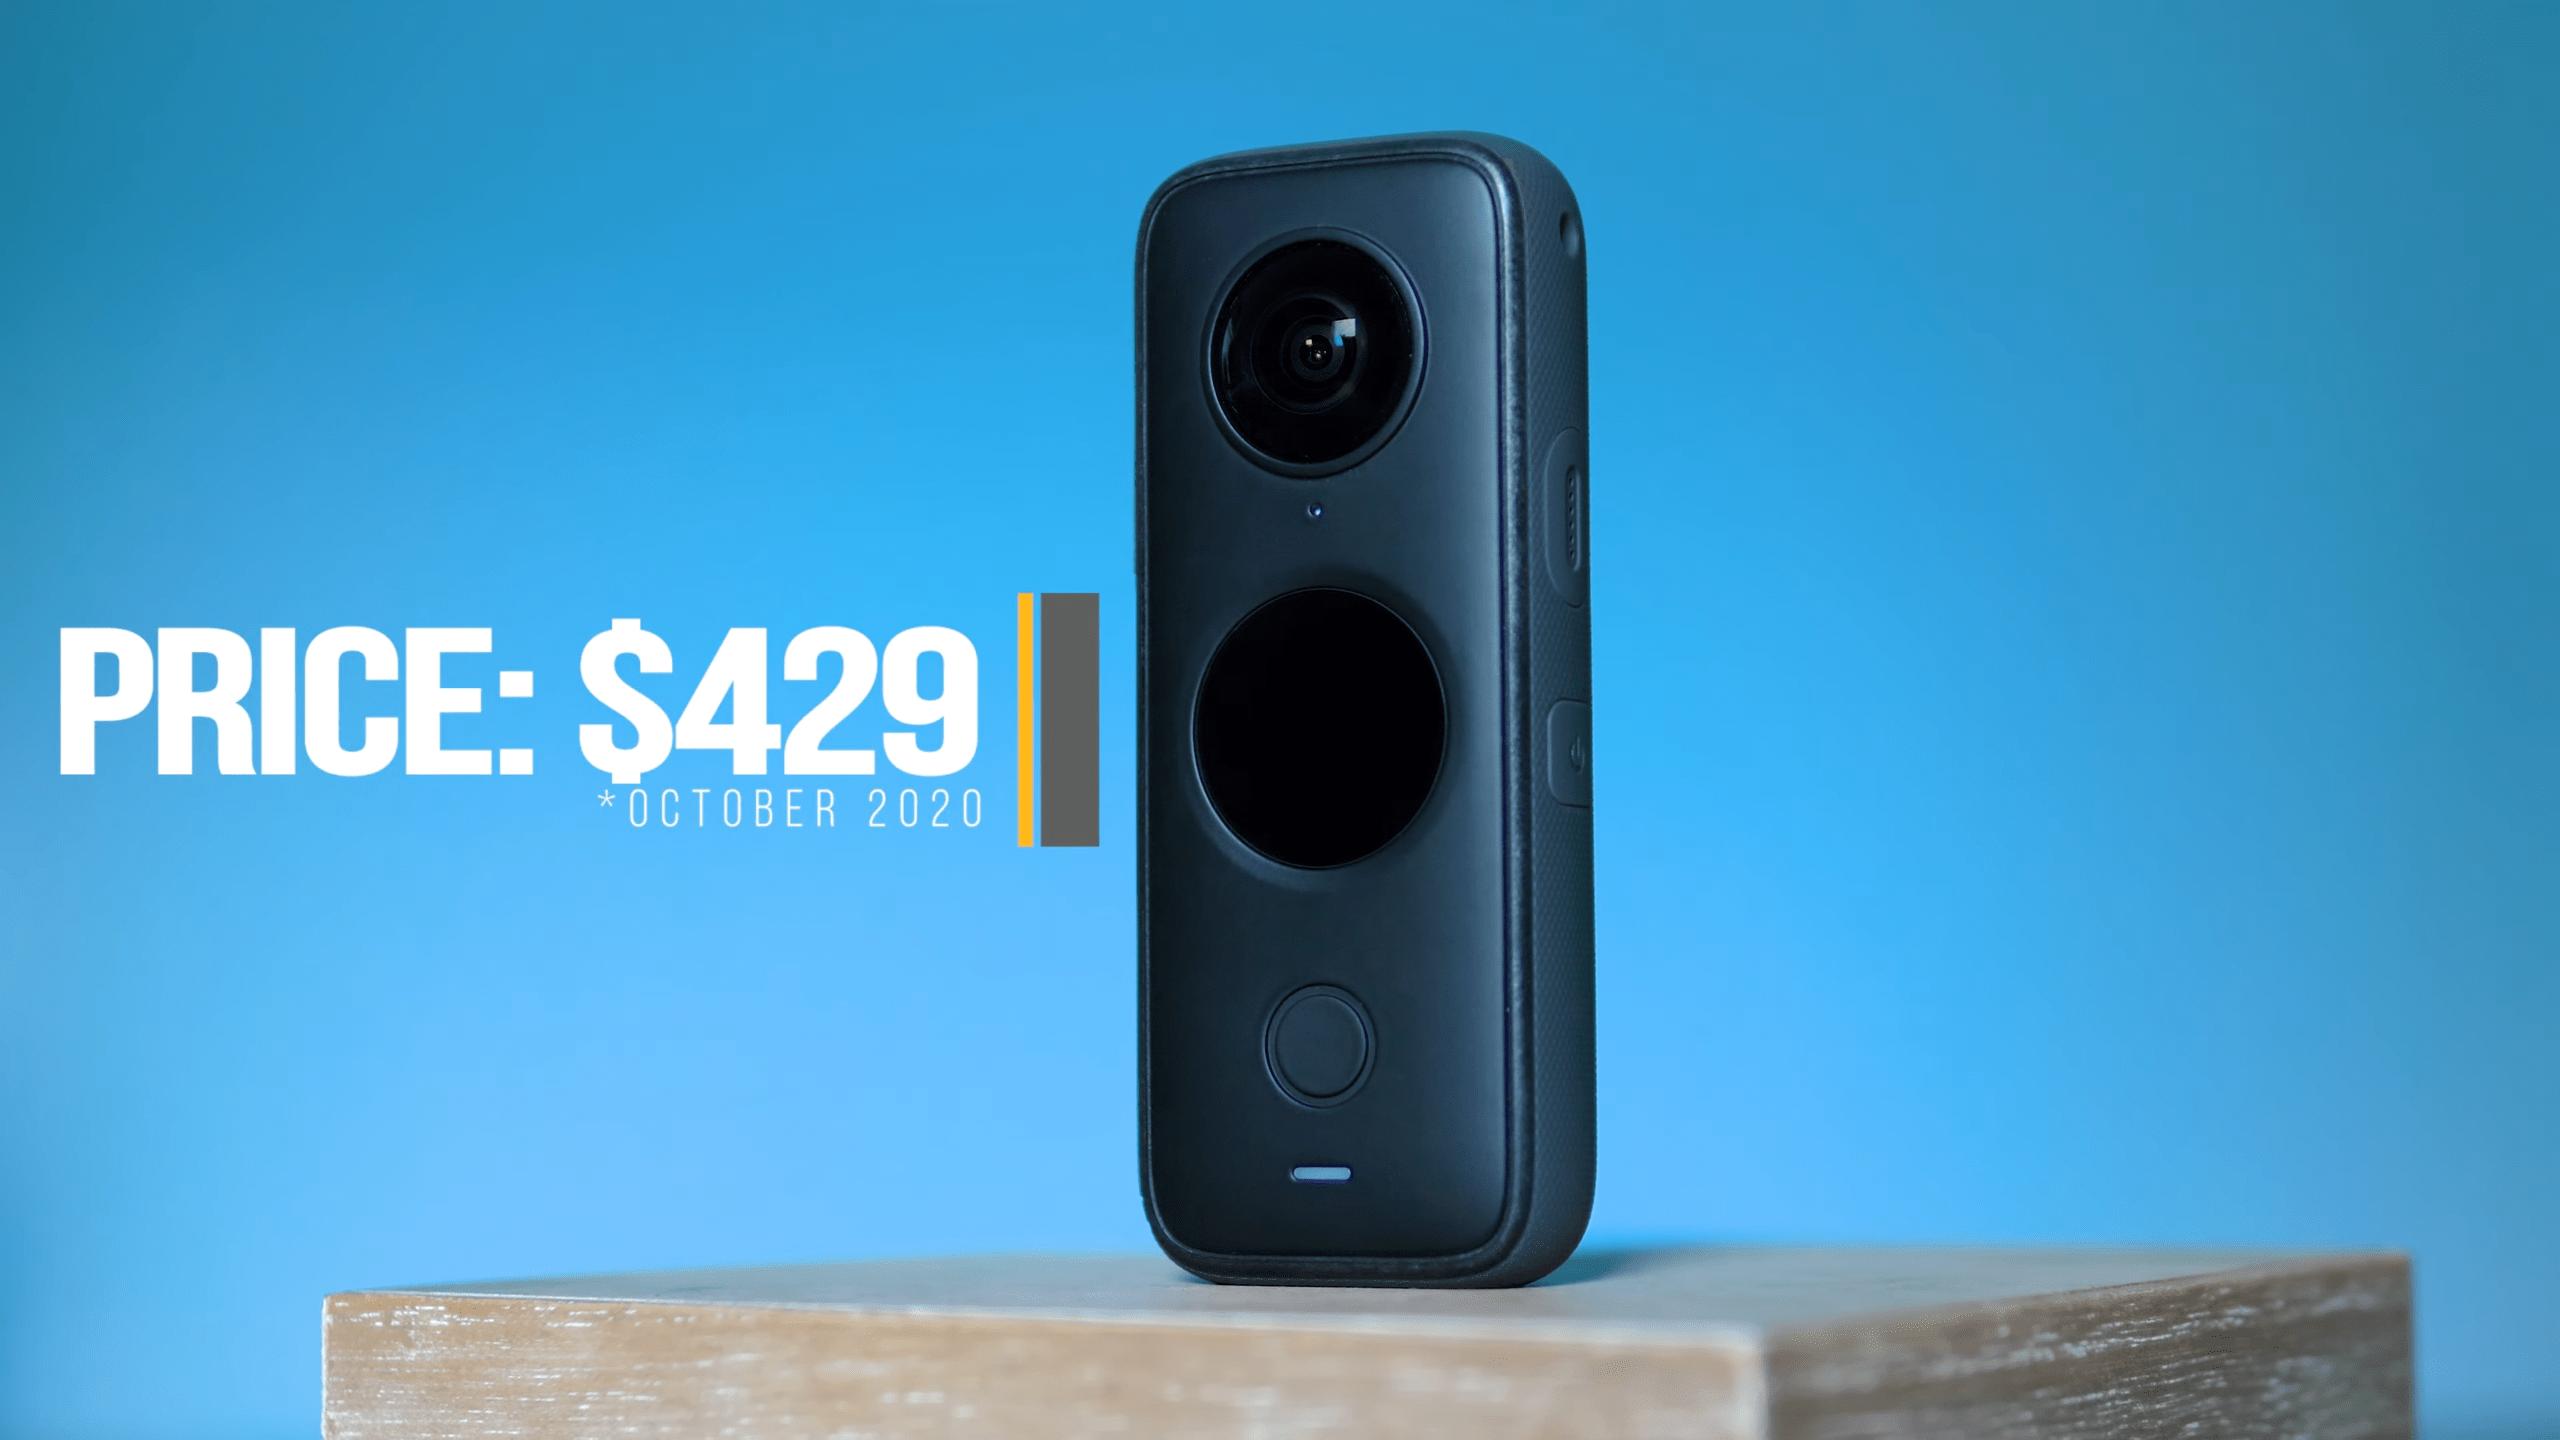 Insta360 ONE X2 Panoramic Action Camera Price